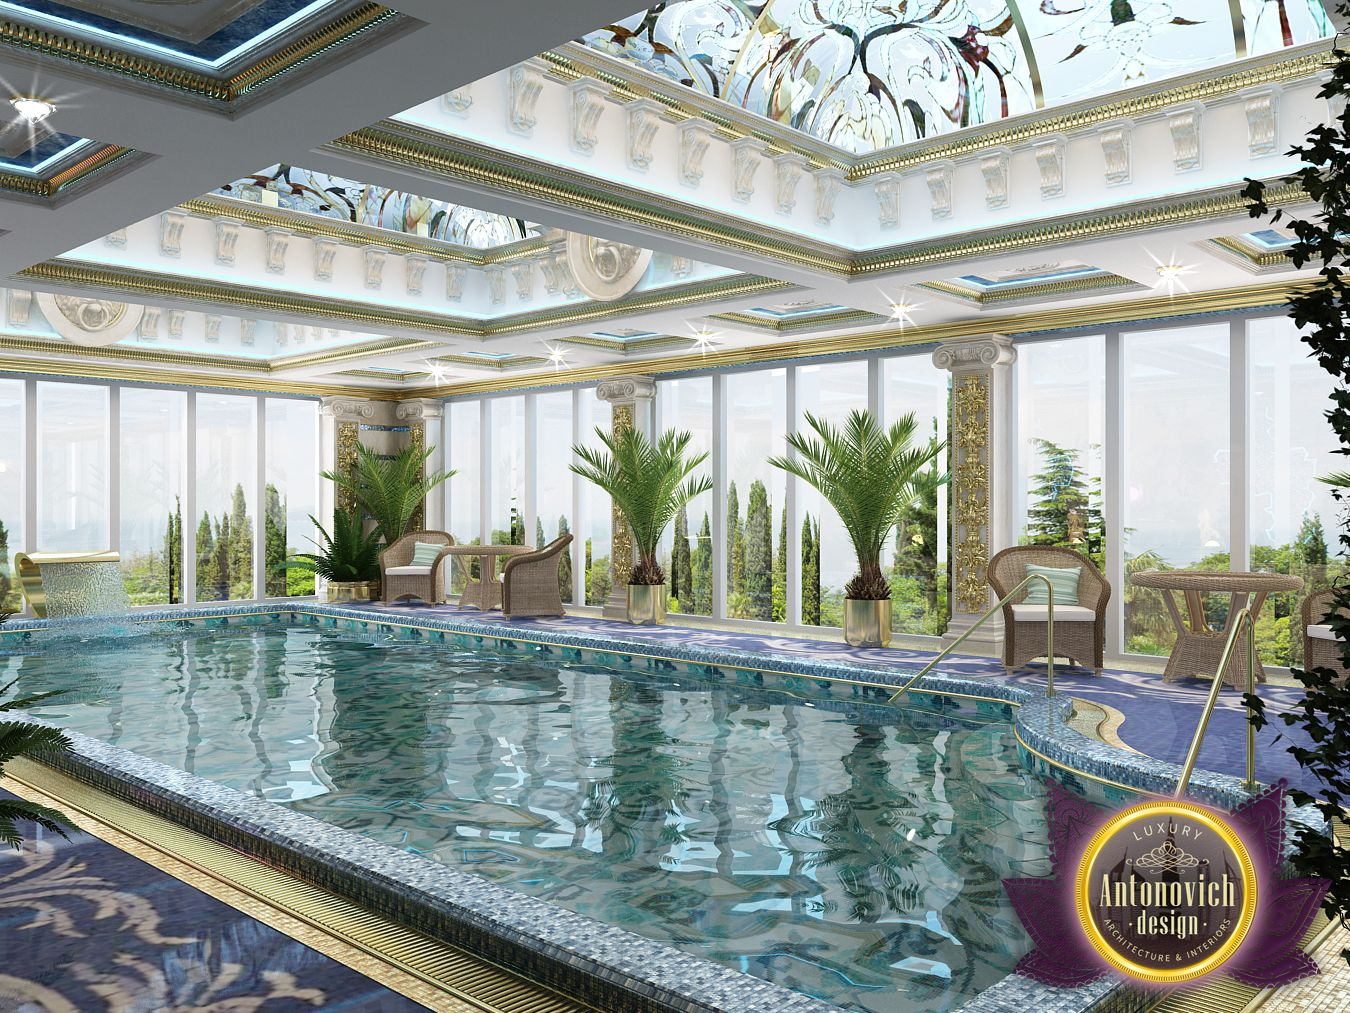 Luxury antonovich design uae 2016 for Luxury pool designs